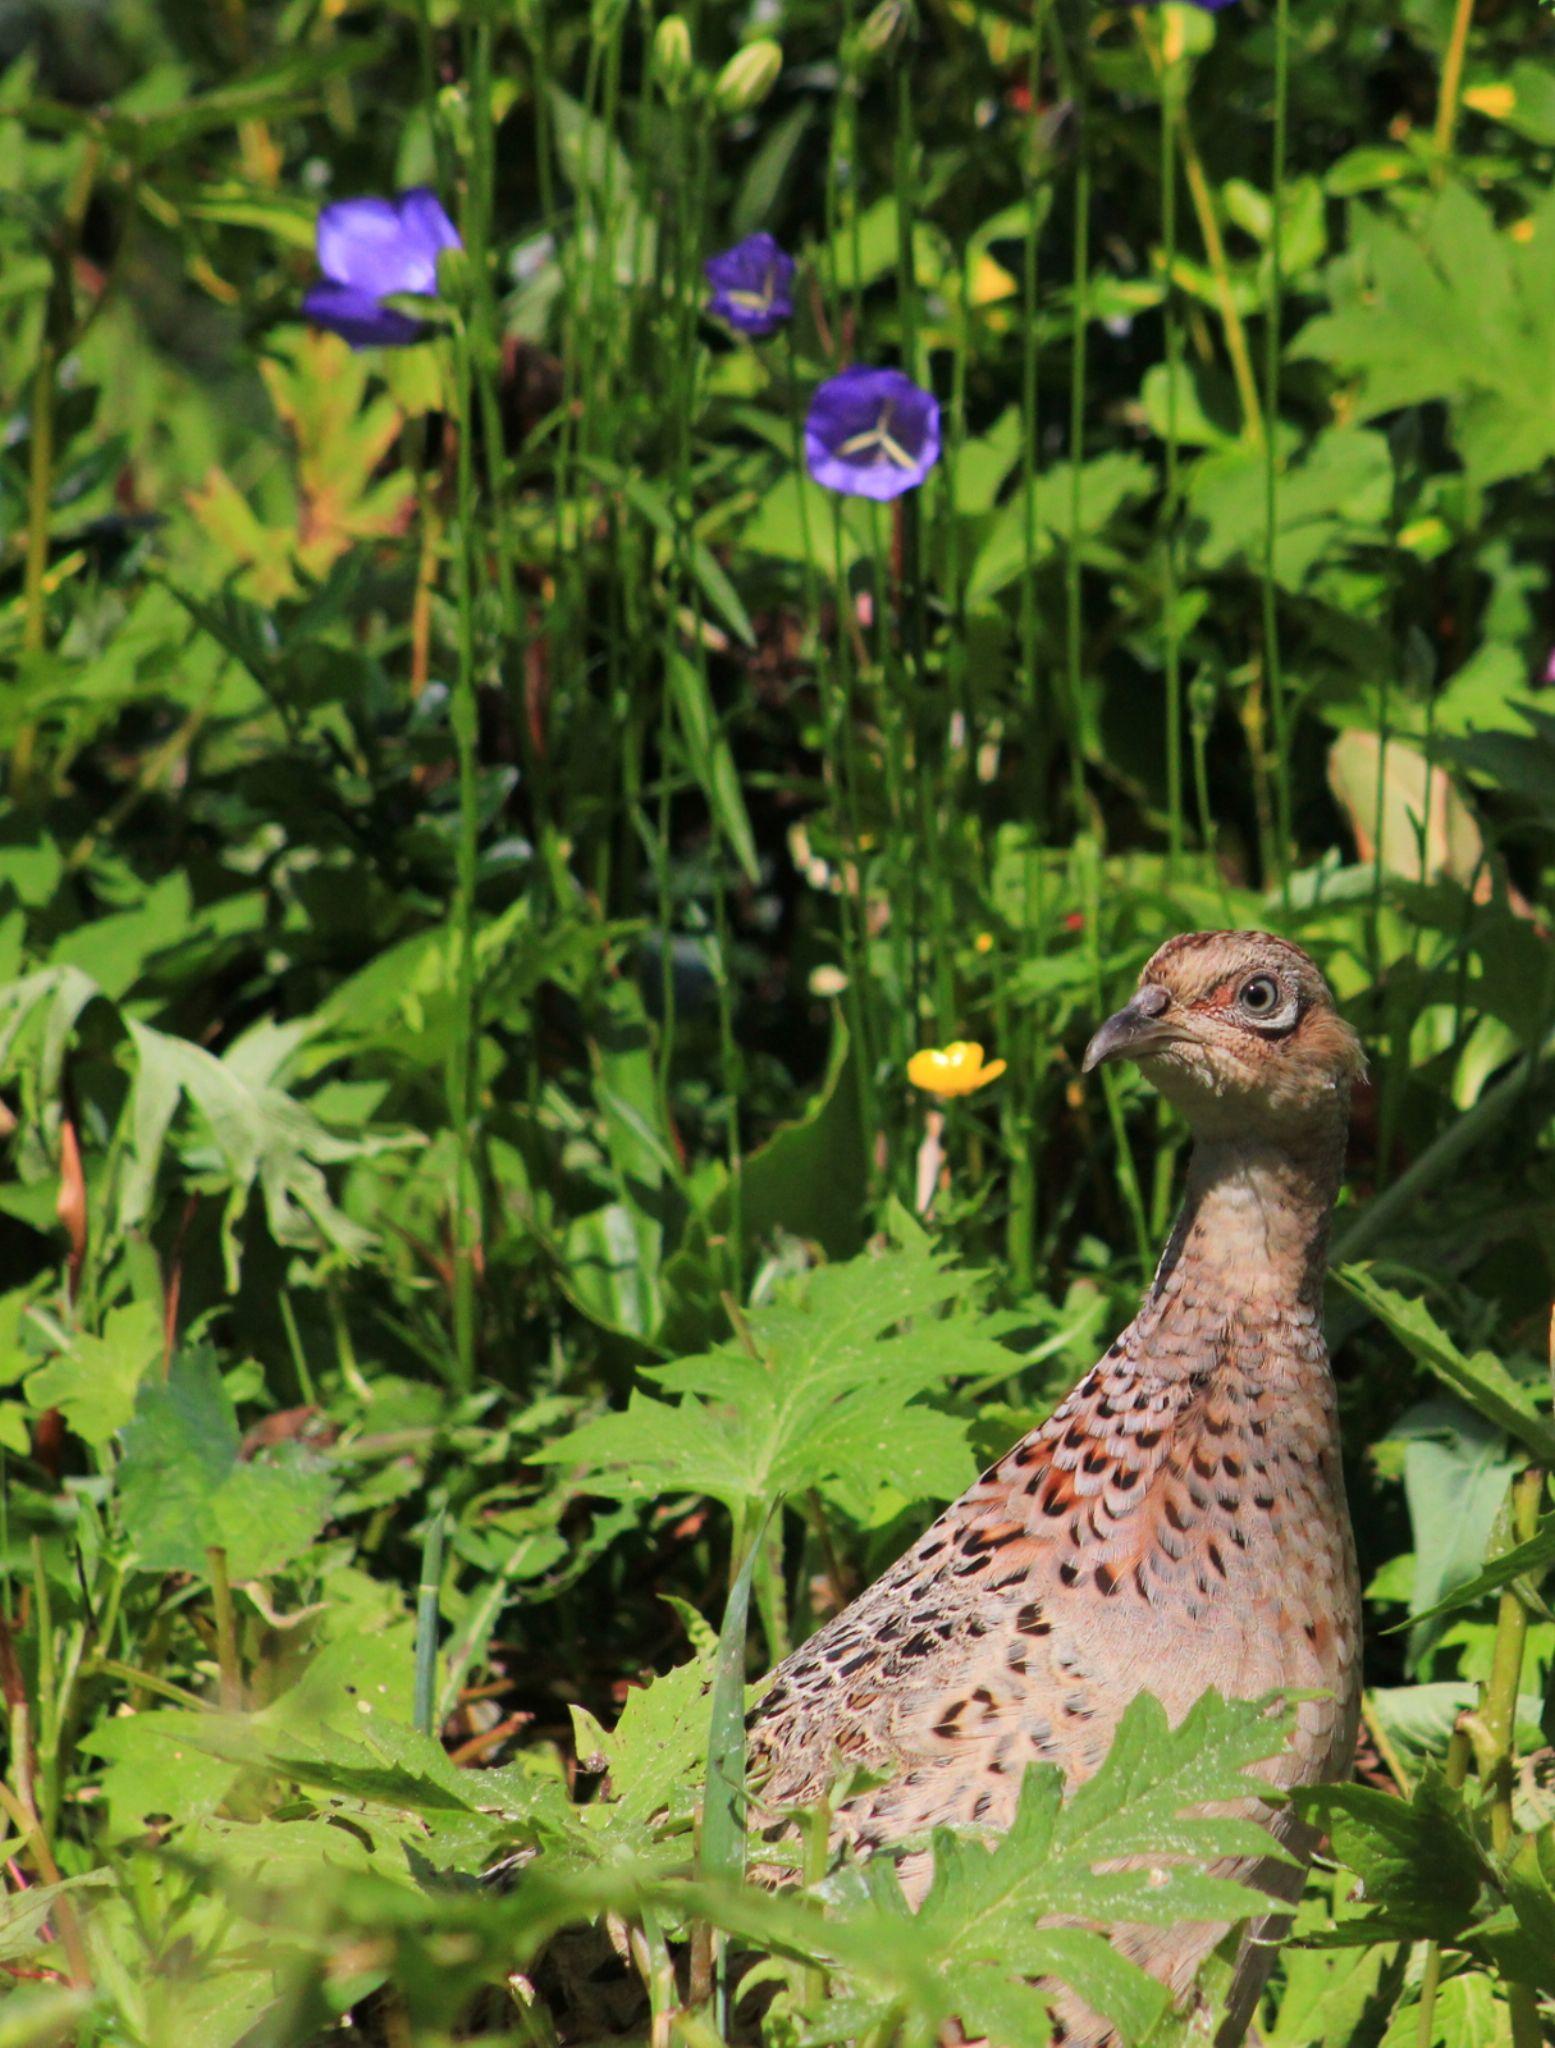 Pheasant by Turnip Towers